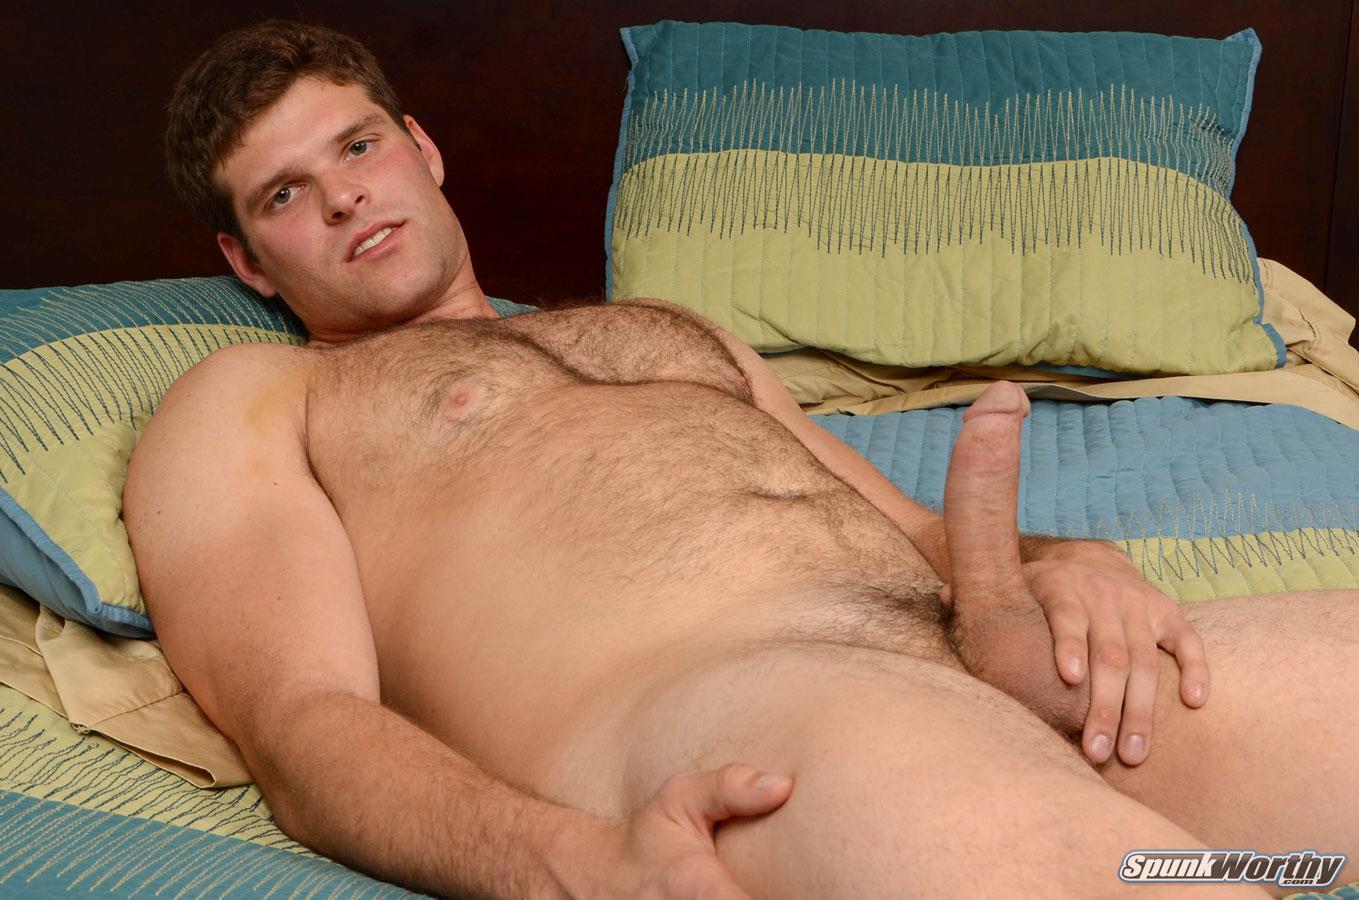 SpunkWorthy-Jake-Straight-Hairy-Navy-Bear-Cub-Jerking-Off-Amateur-Gay-Porn-16 Straight Hairy Navy Bear Cub Jerks His Hairy Cock